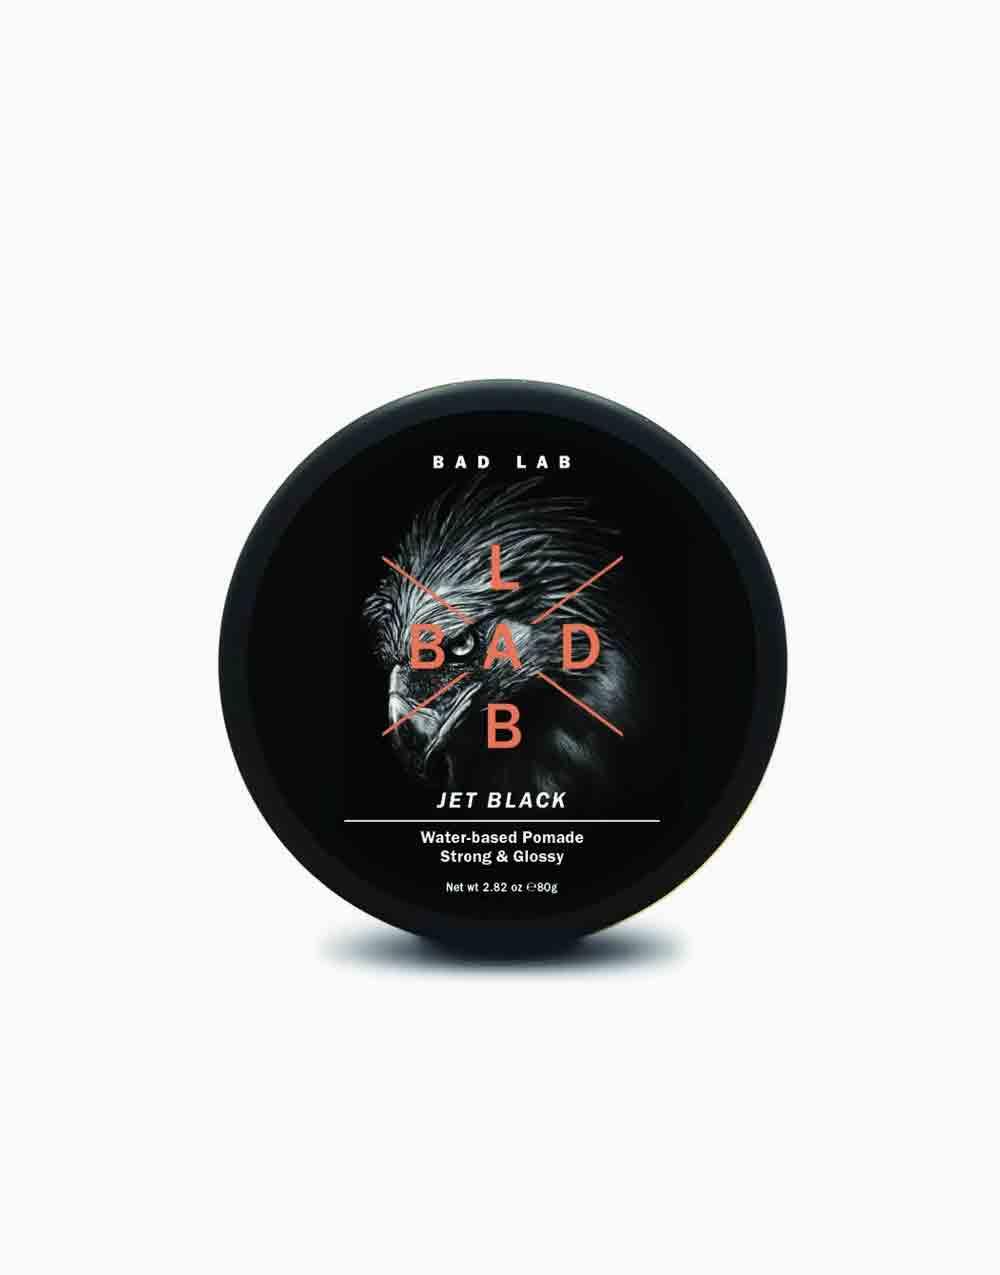 Jet Black Water Based Pomade by Bad Lab